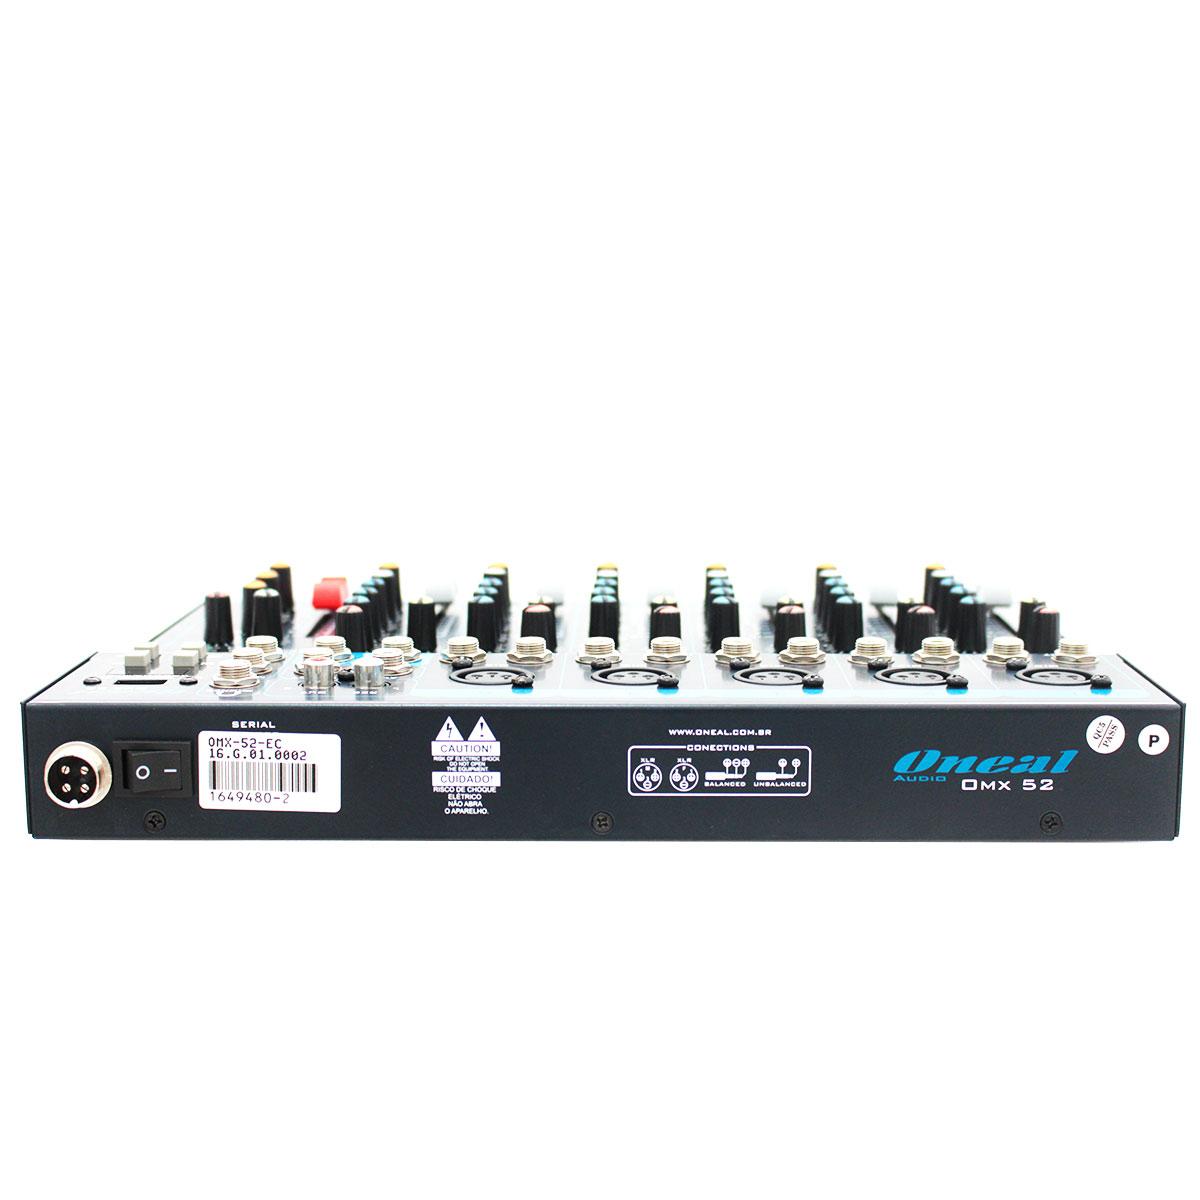 Mesa de Som / Mixer 5 Canais c/ USB OMX 52 - Oneal